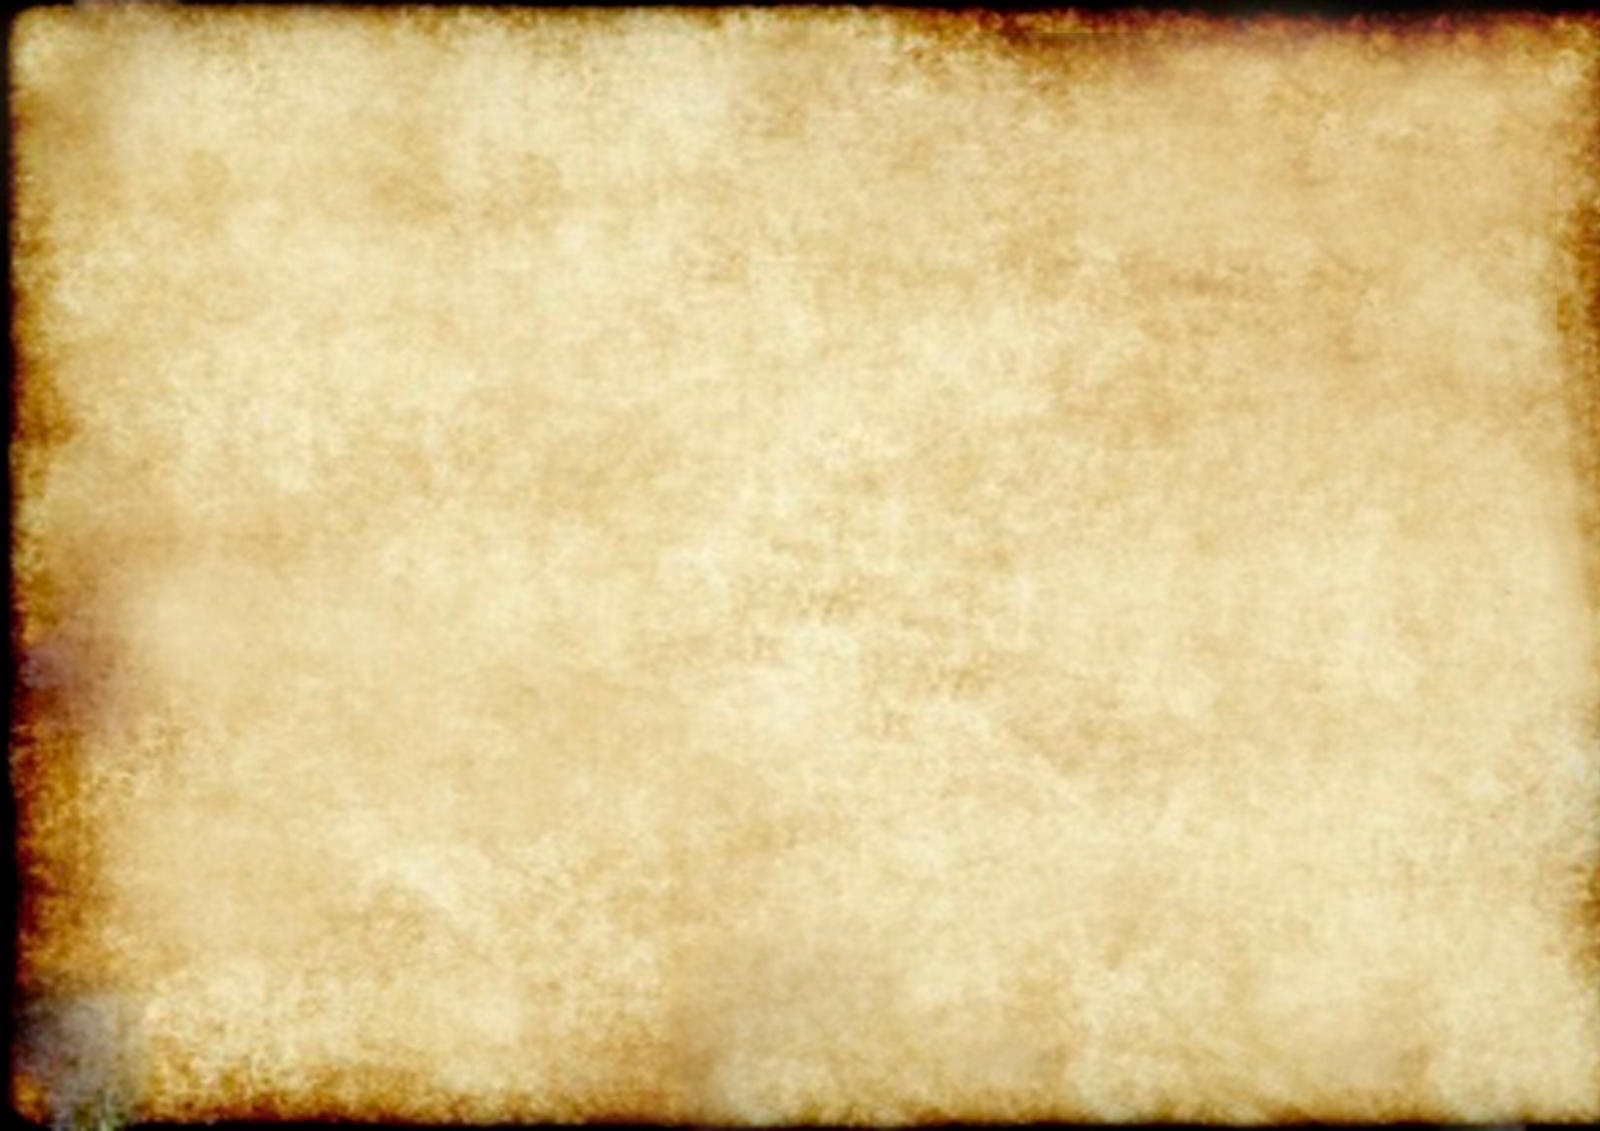 Old paper texture by olebern on DeviantArt